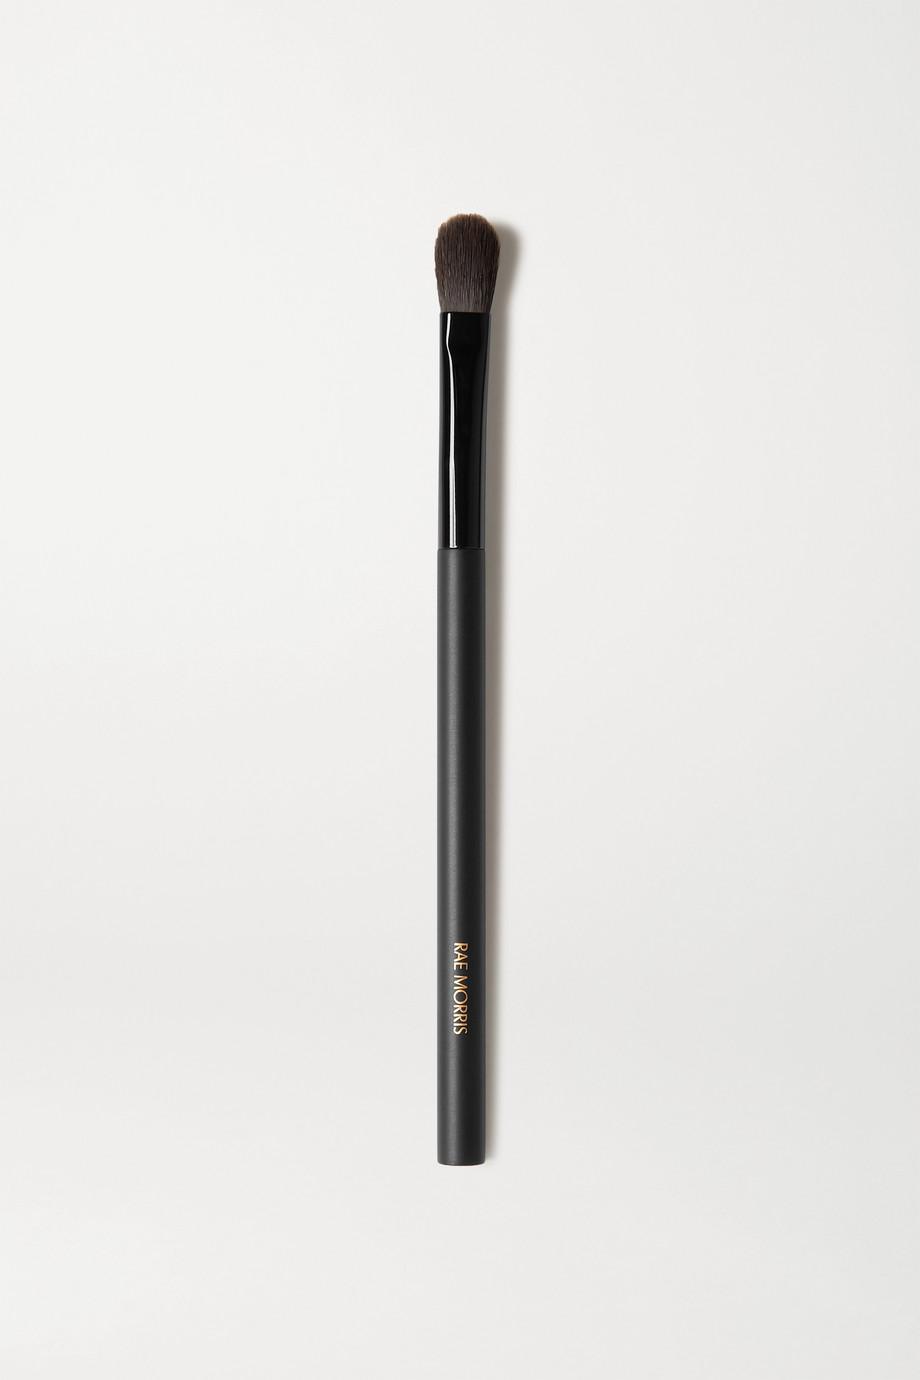 Rae Morris Jishaku 11.1 Vegan Small Oval Shadow Brush – Lidschattenpinsel